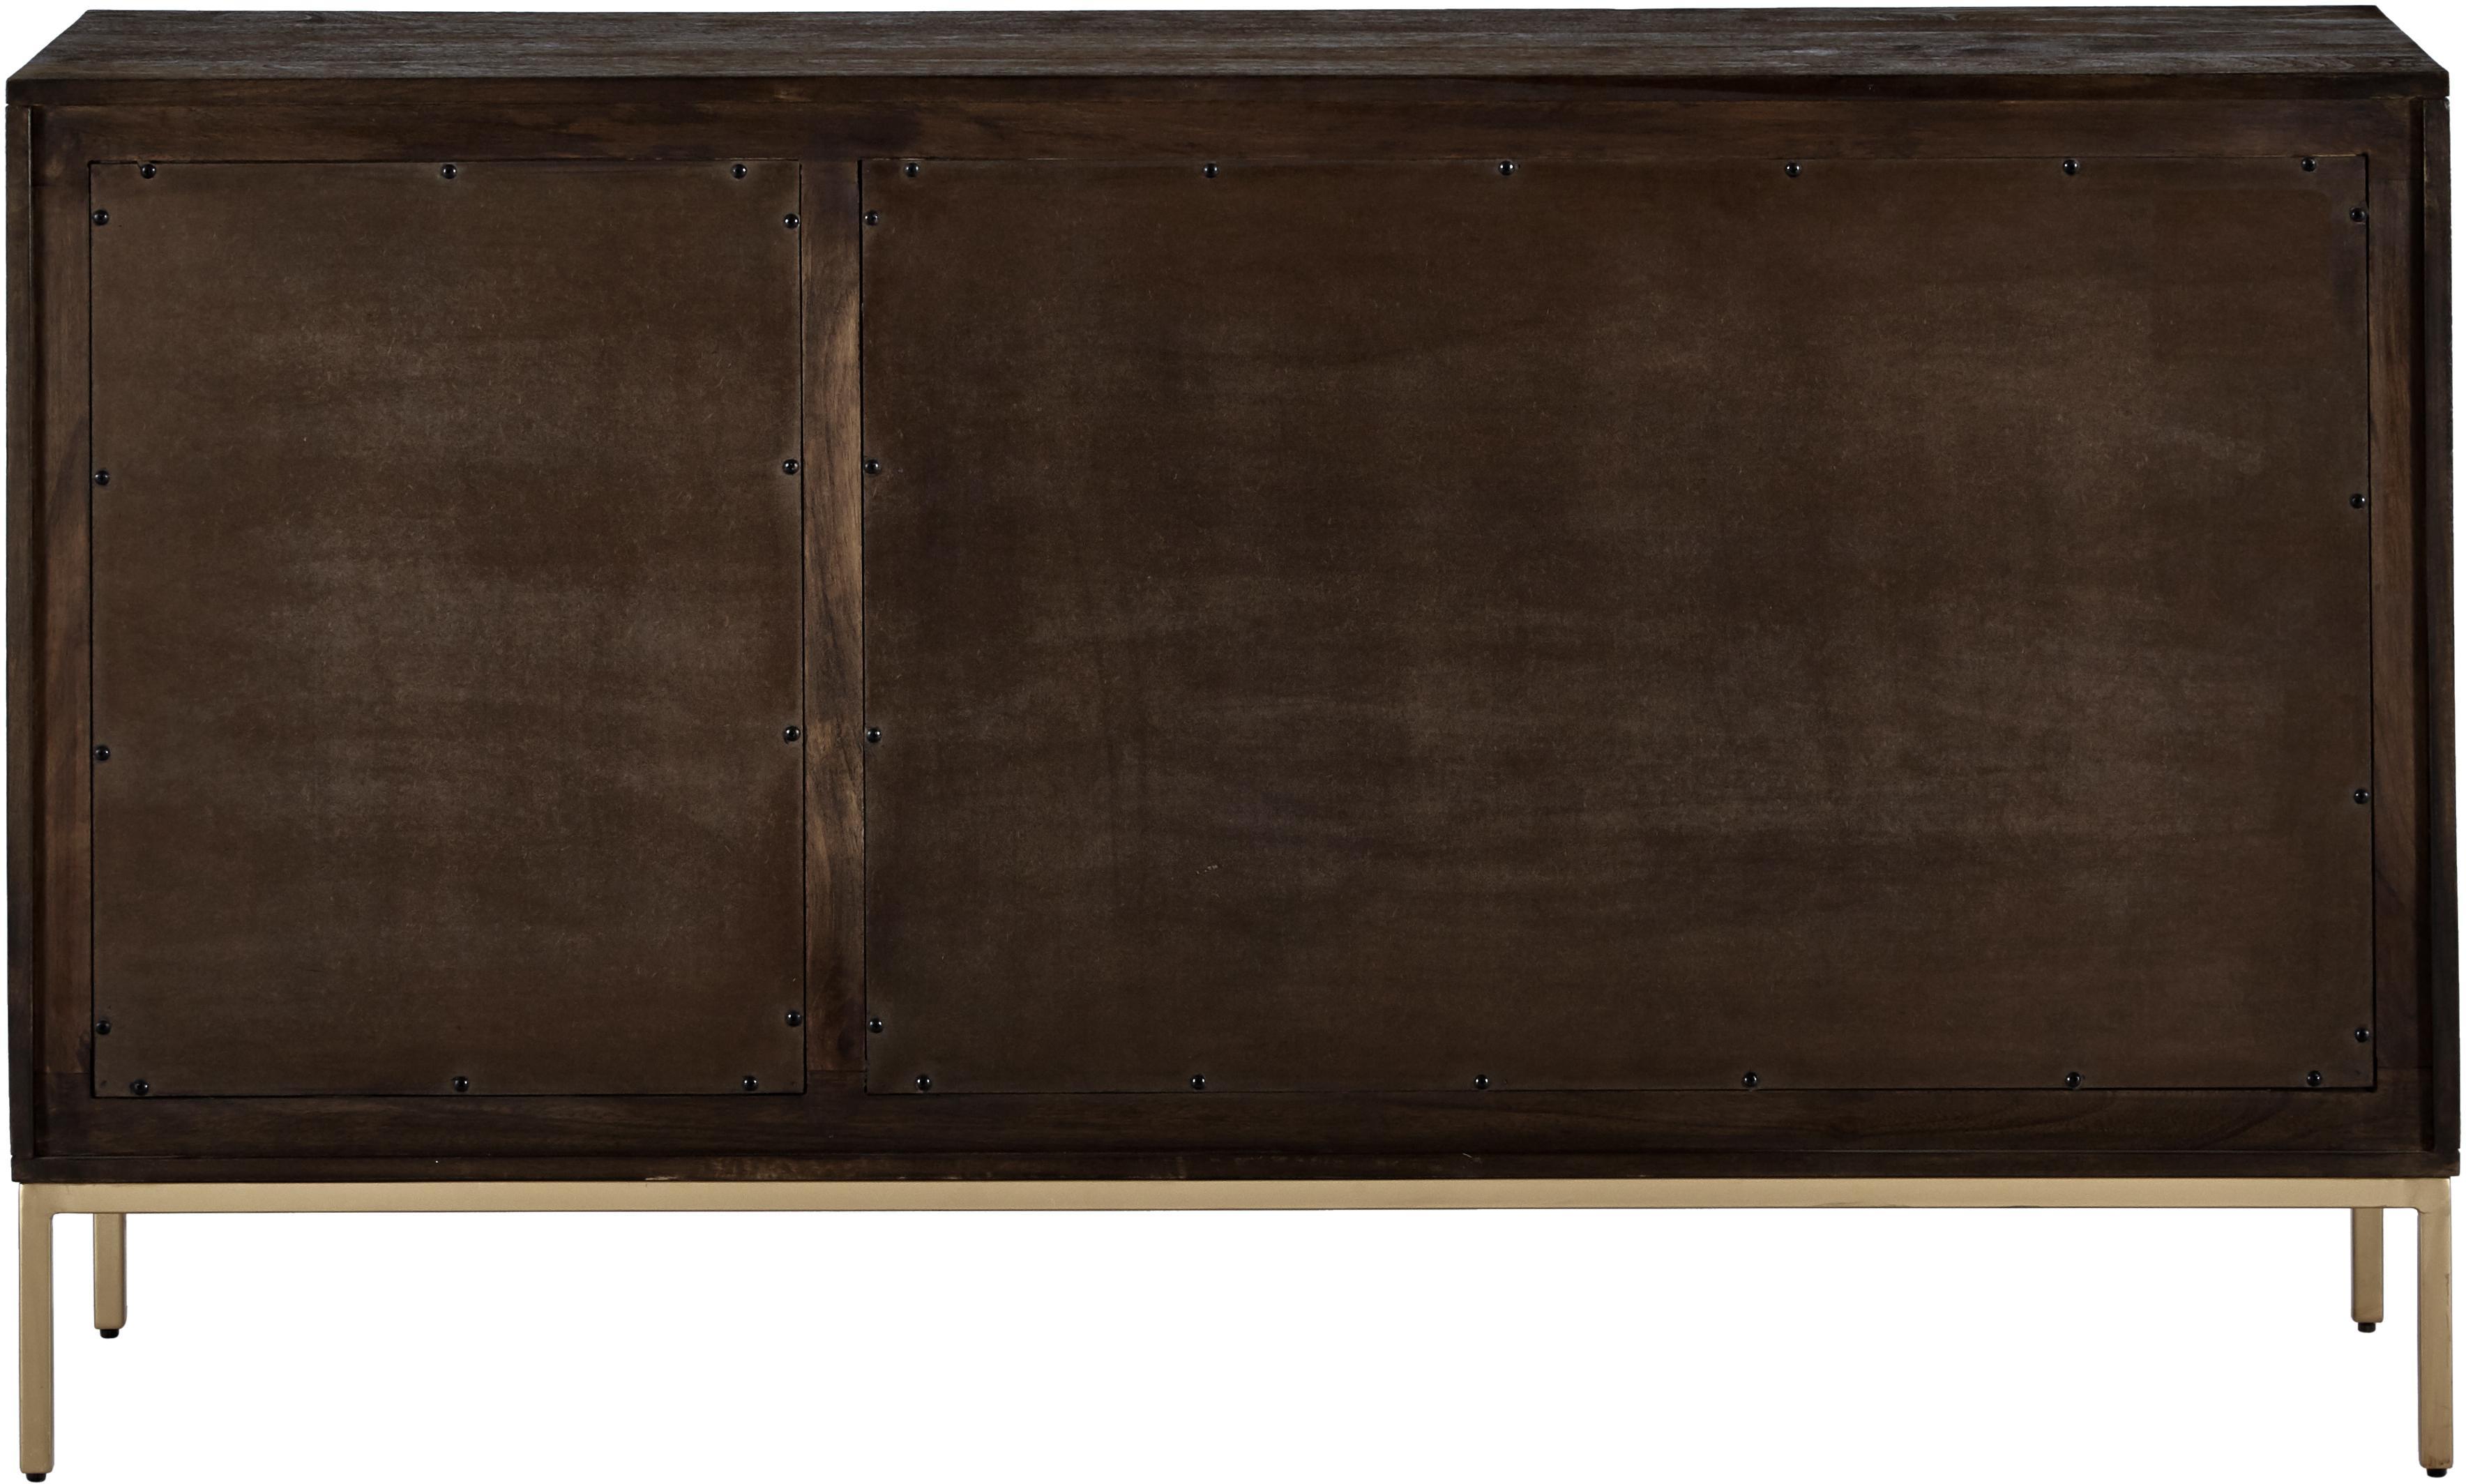 Massivholz Sideboard Clive, Korpus: Massives Mangoholz, lacki, Griffe: Metall, pulverbeschichtet, Gestell: Metall, pulverbeschichtet, Mangoholz, Goldfarben, 150 x 85 cm